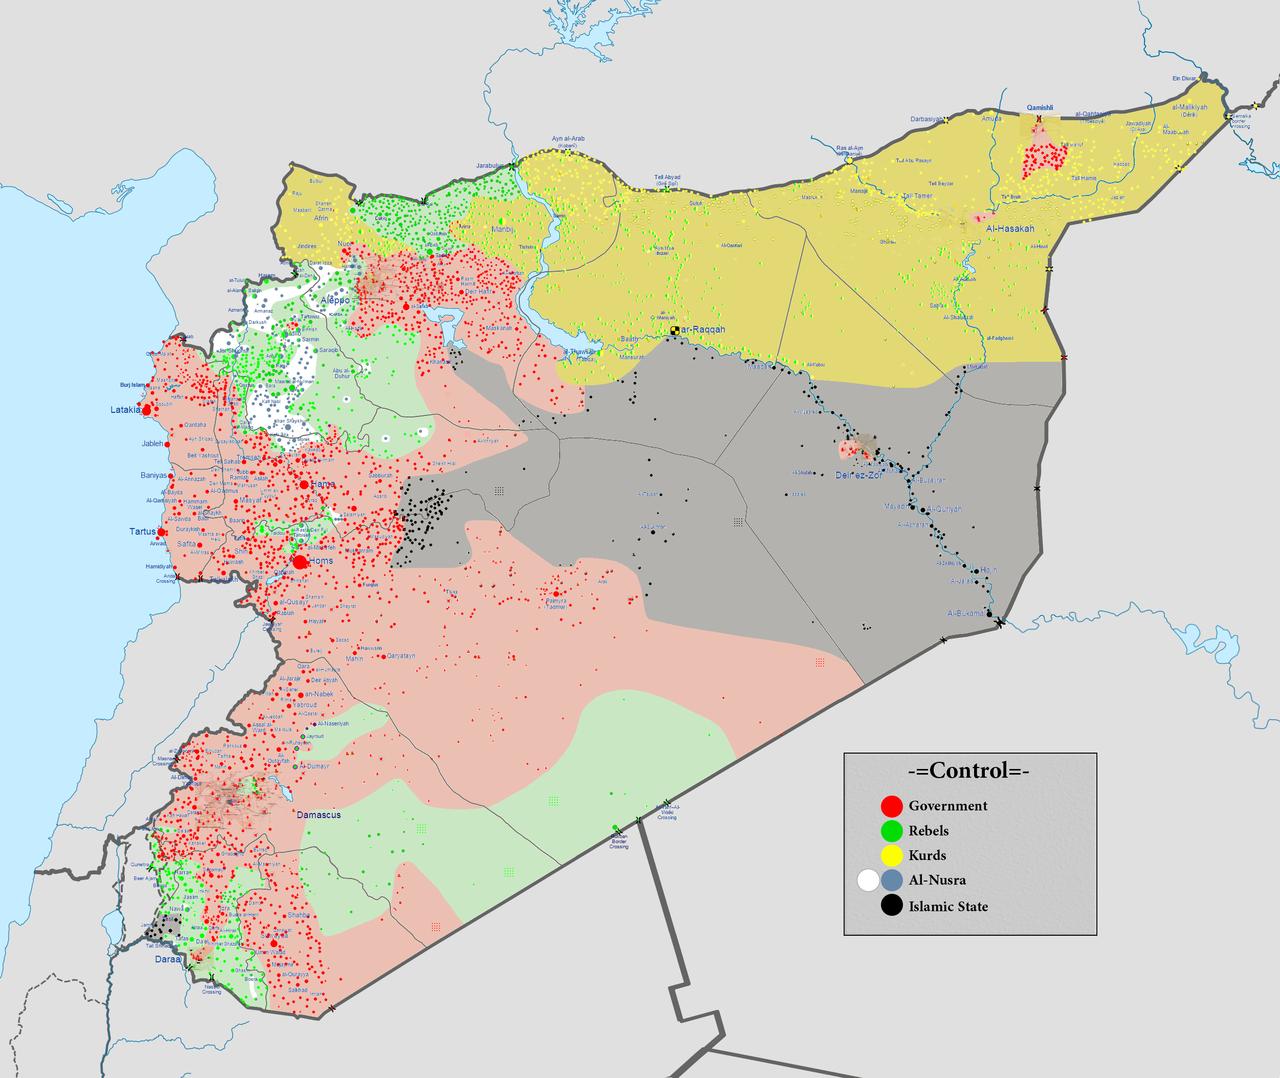 acuzatii-reciproce-intre-washington-si-moscova-in-problema-siriana